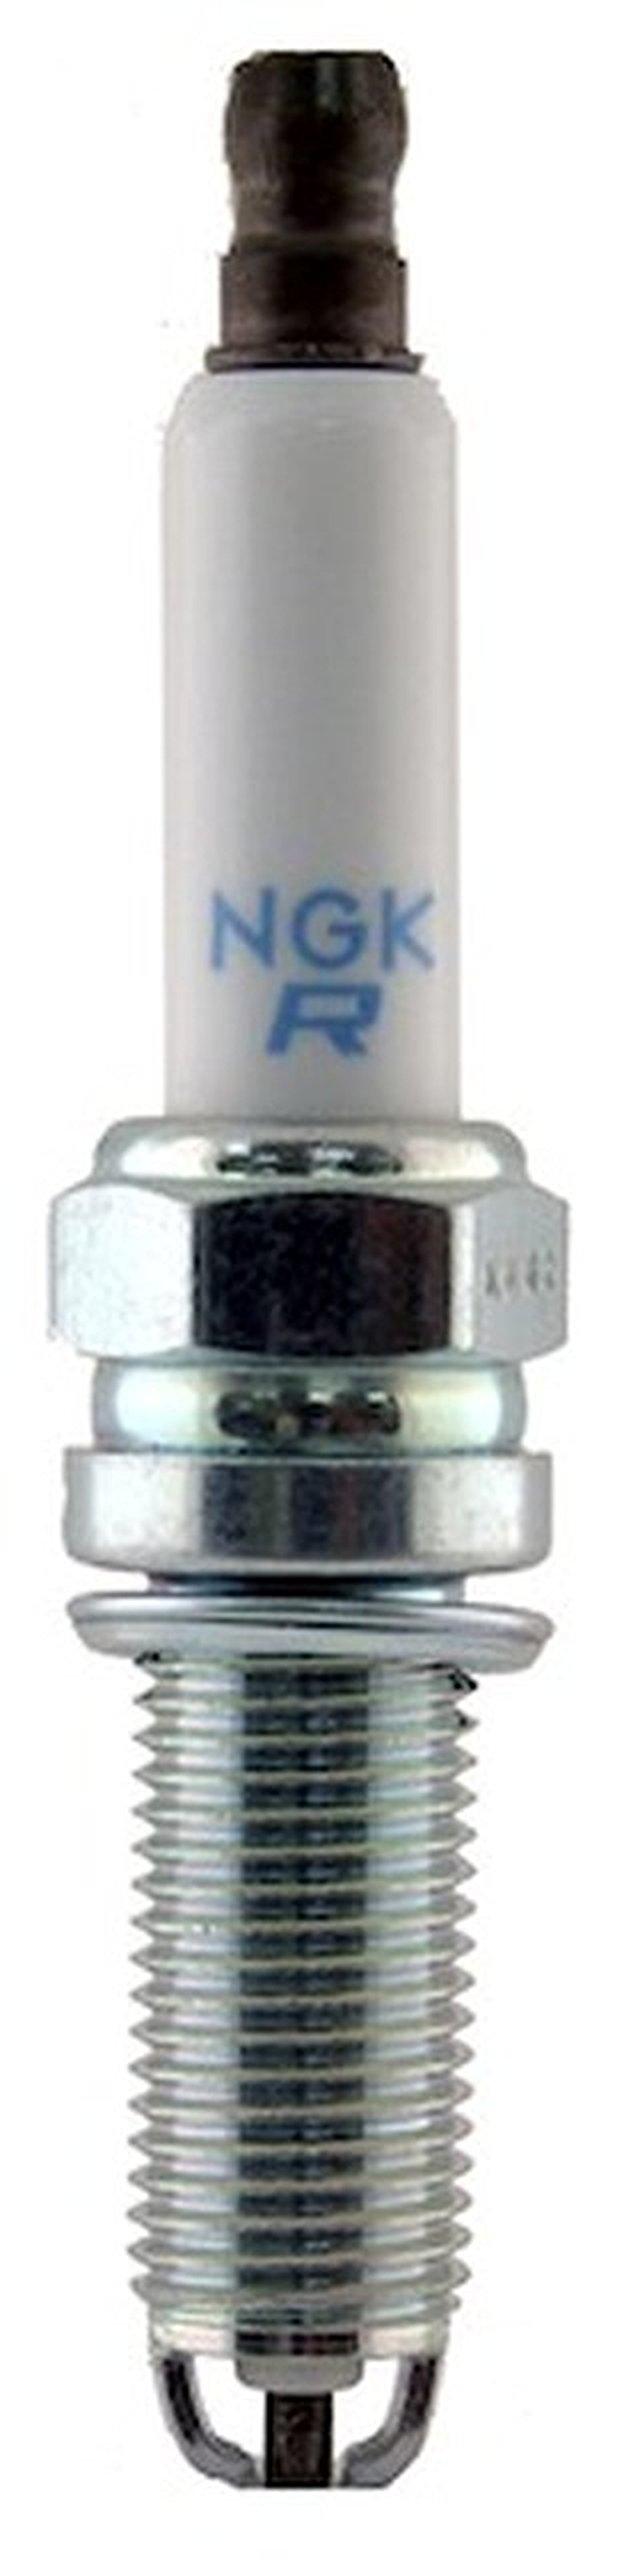 Set (8pcs) NGK Laser Platinum Spark Plugs Stock 4471 Nickel Core Tip Standard 0.036in LKR8AP